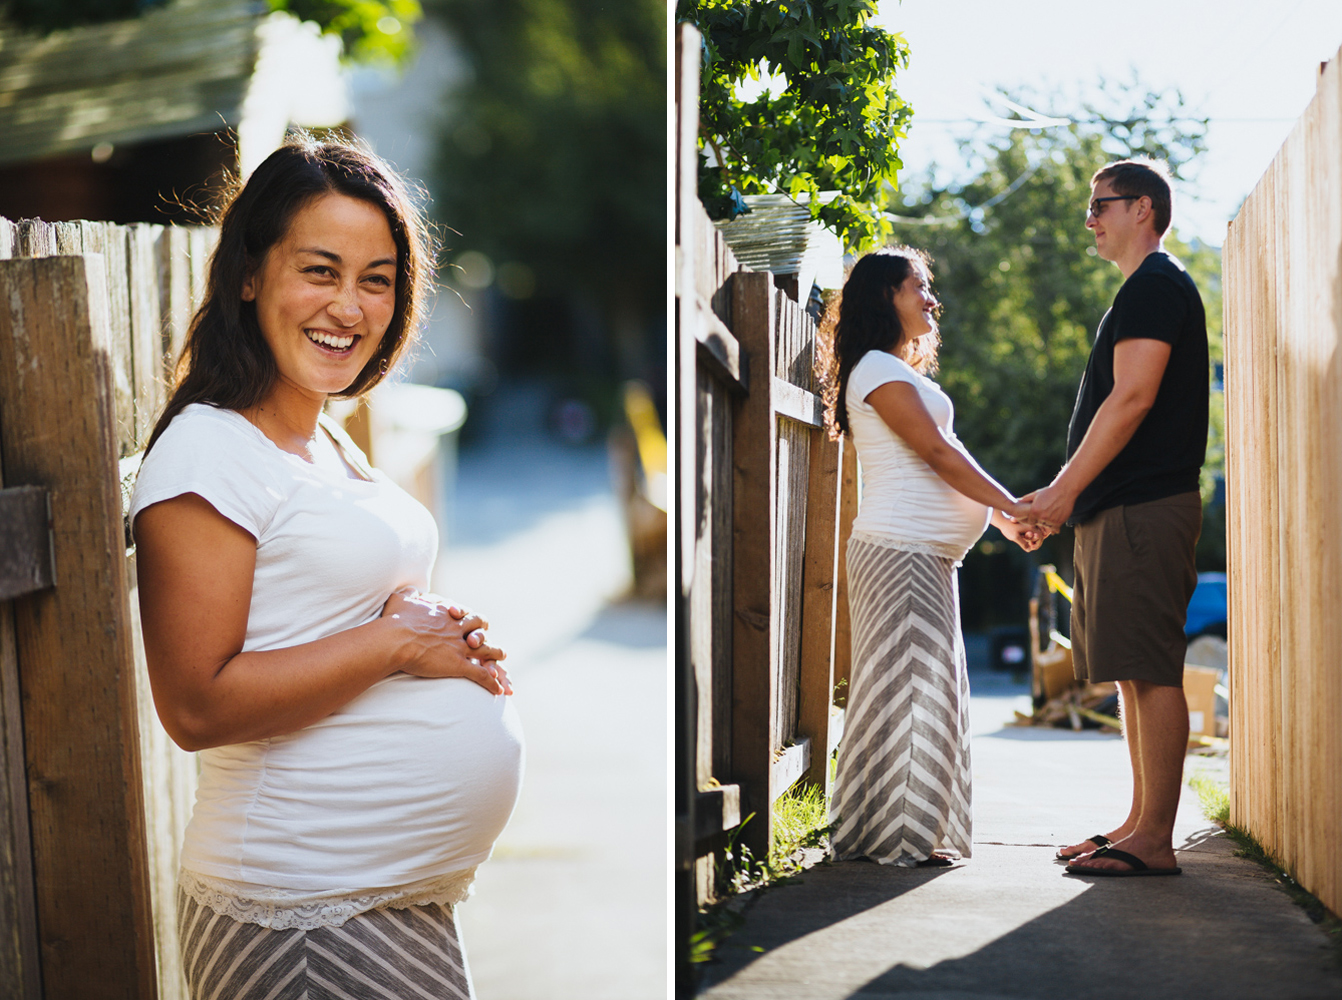 p&m pregnancy blog 3.5